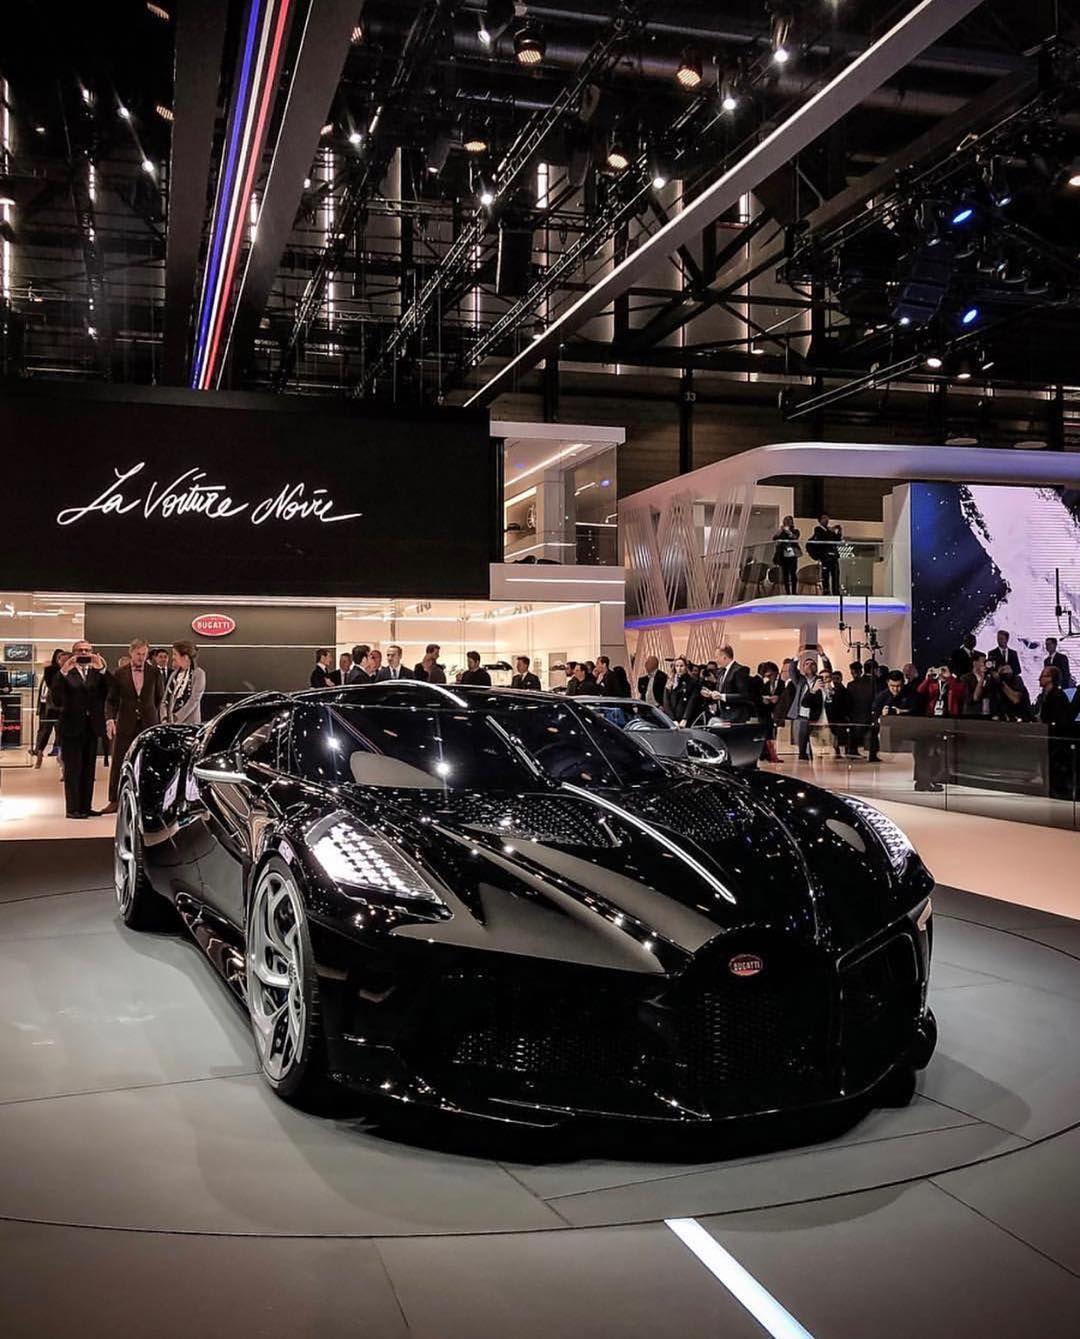 Arabmoney Official On Instagram The All New Bugatti La Voiture Noire 1of1 The Most Expensive New Car In The World With A Bugatti Cars Bugatti Super Cars